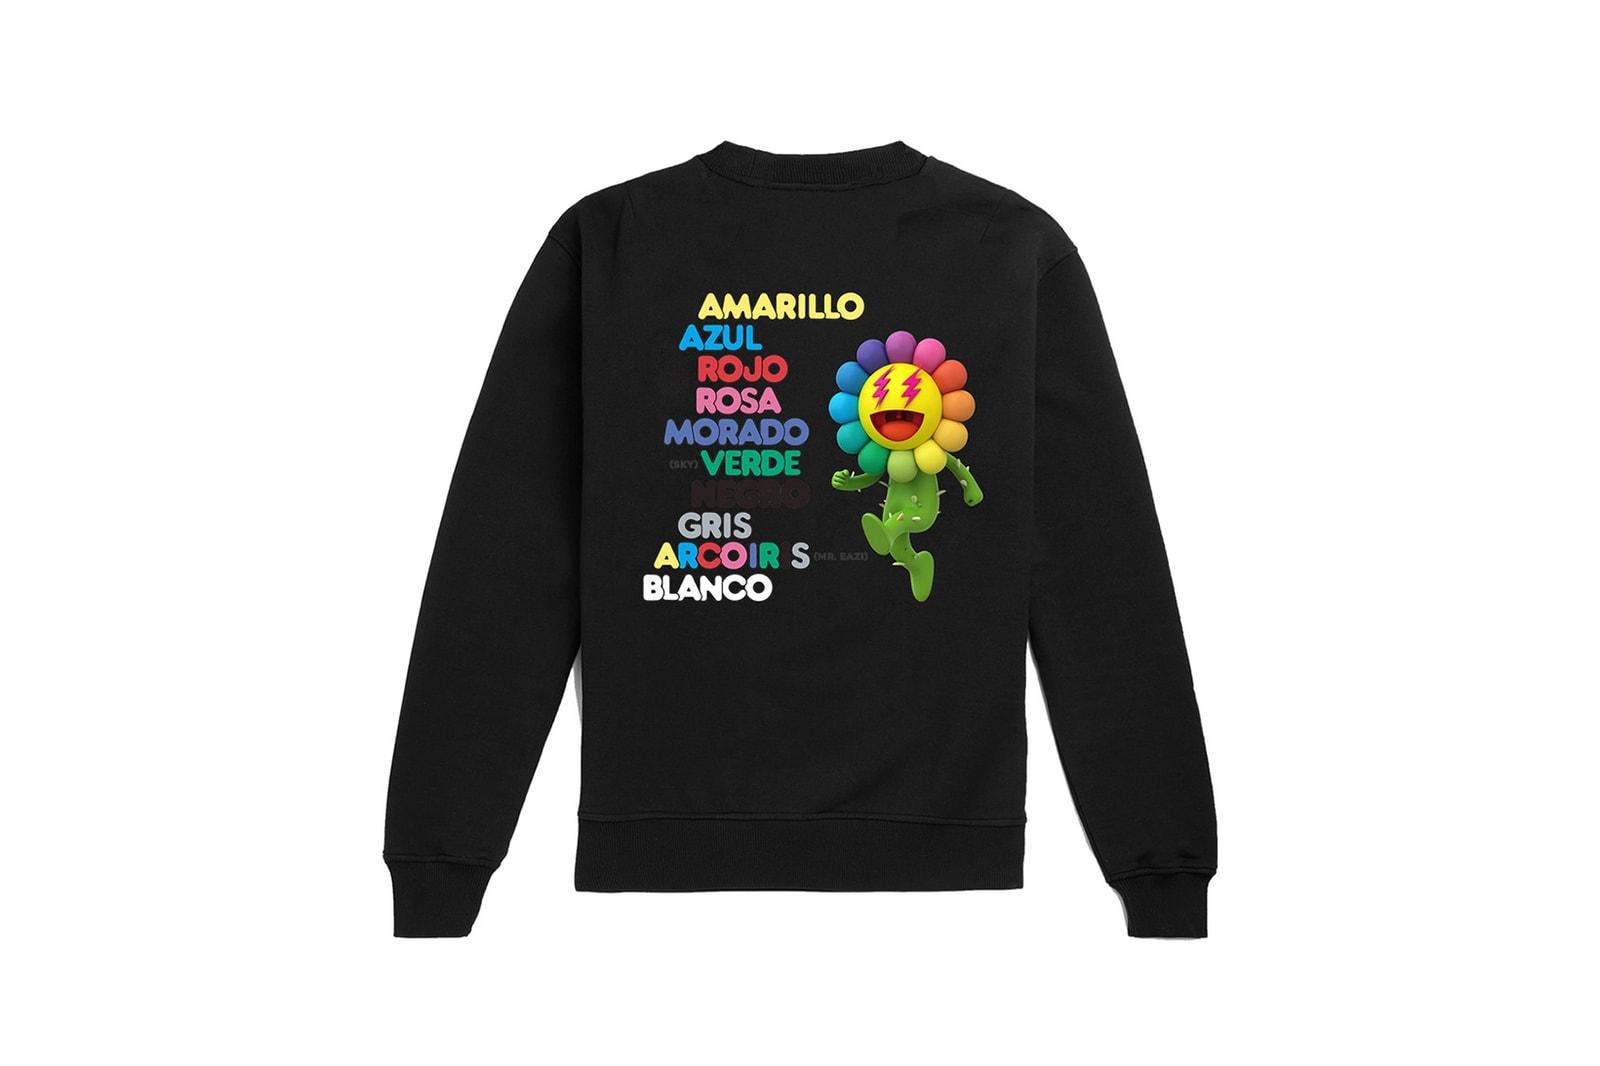 takashi murakami j balvin collaboration drop 4 hoodies t shirts sweatshirts colores album green black flower